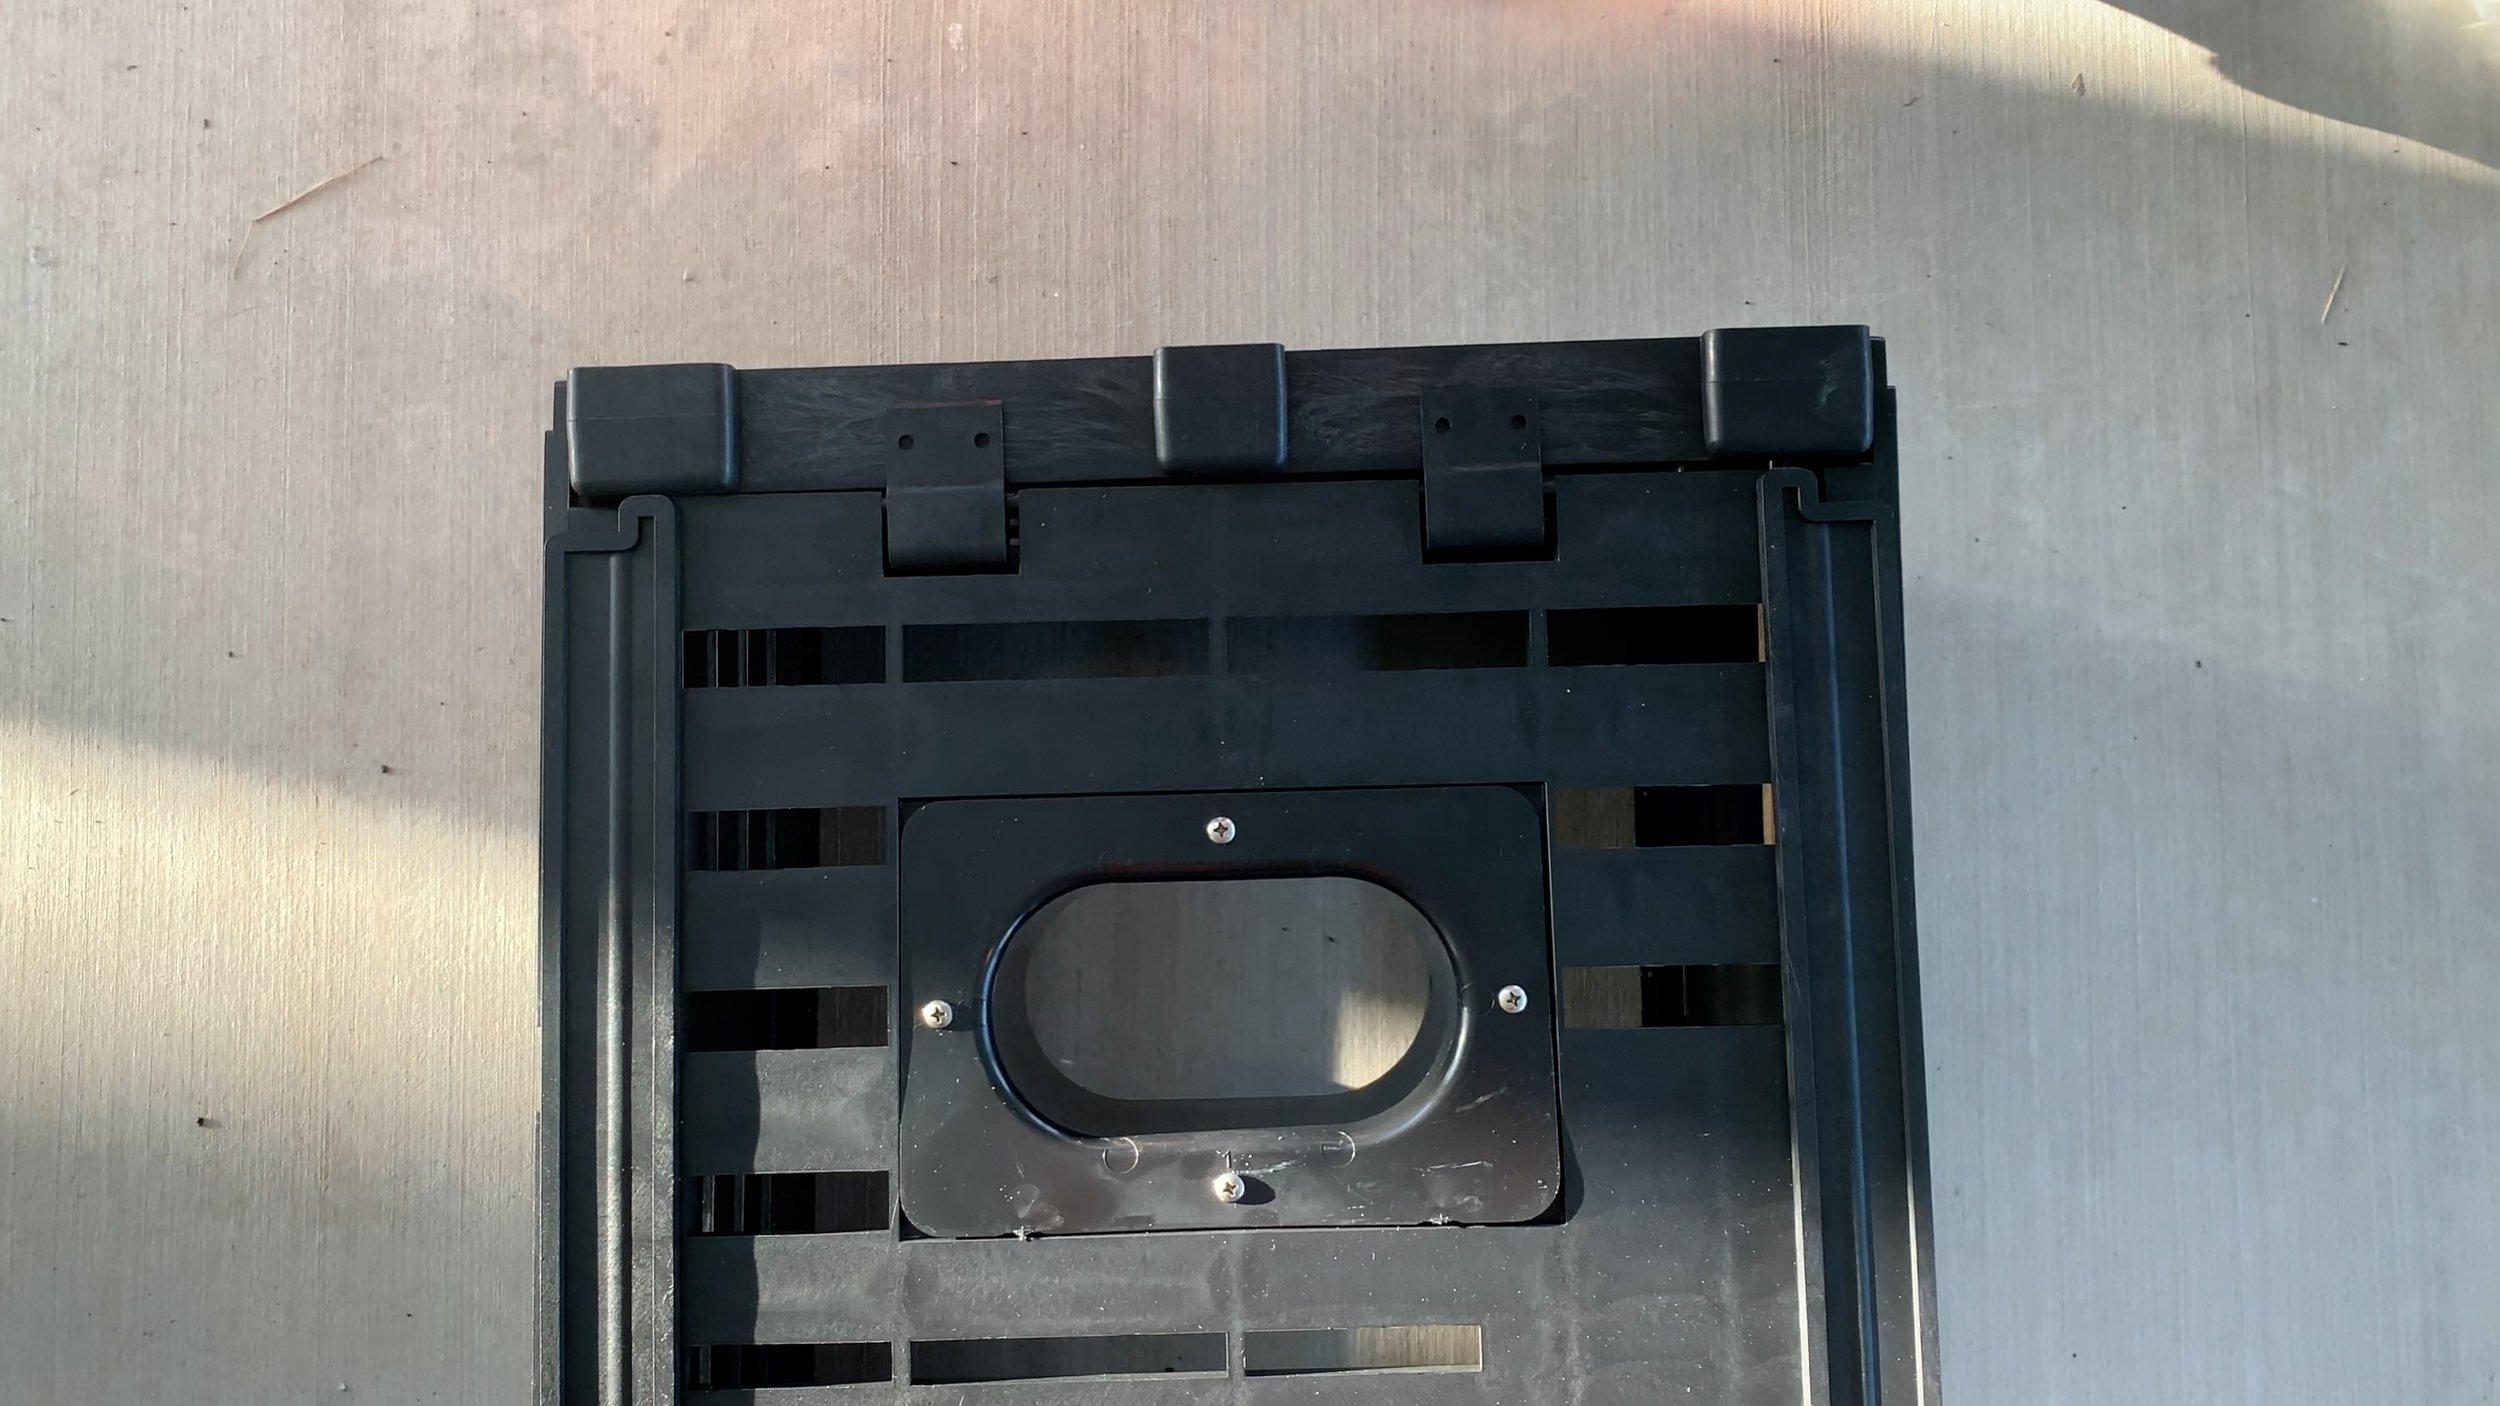 Building traps images 6.jpg